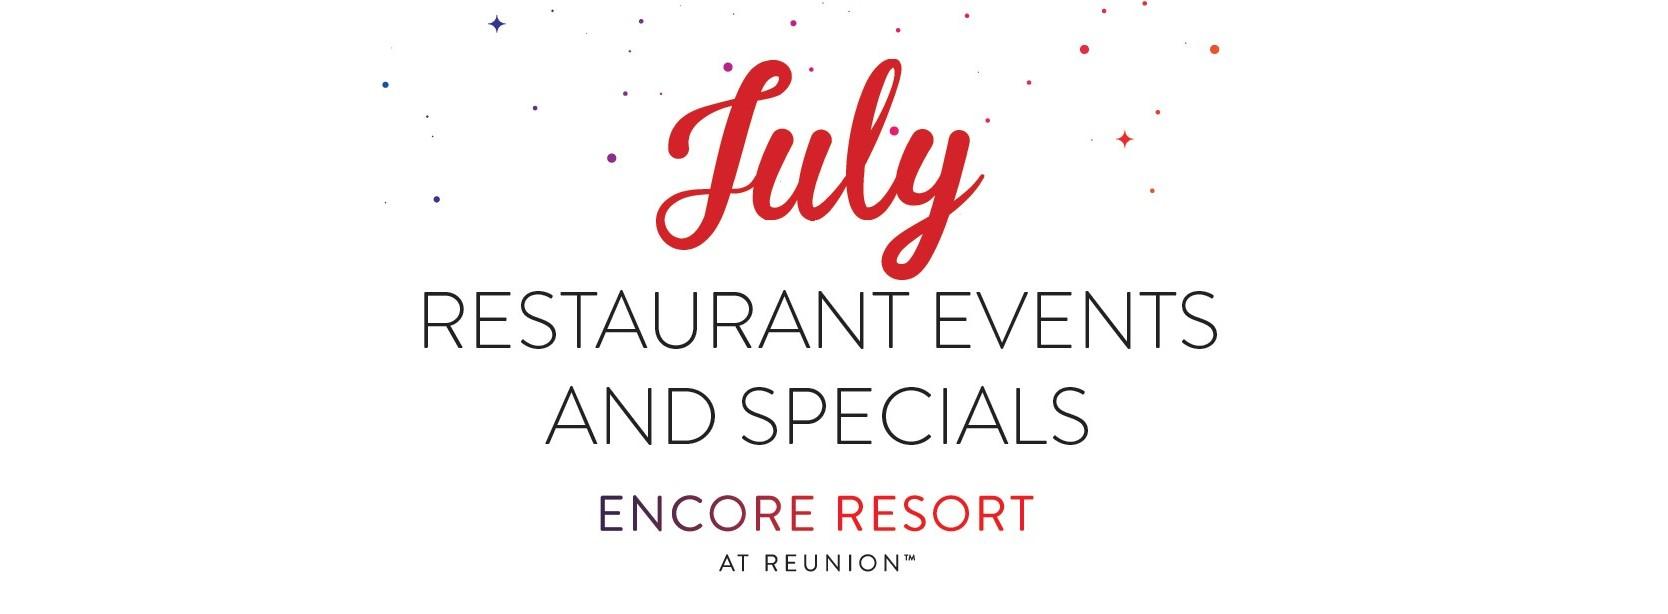 Encore Resort July events banner